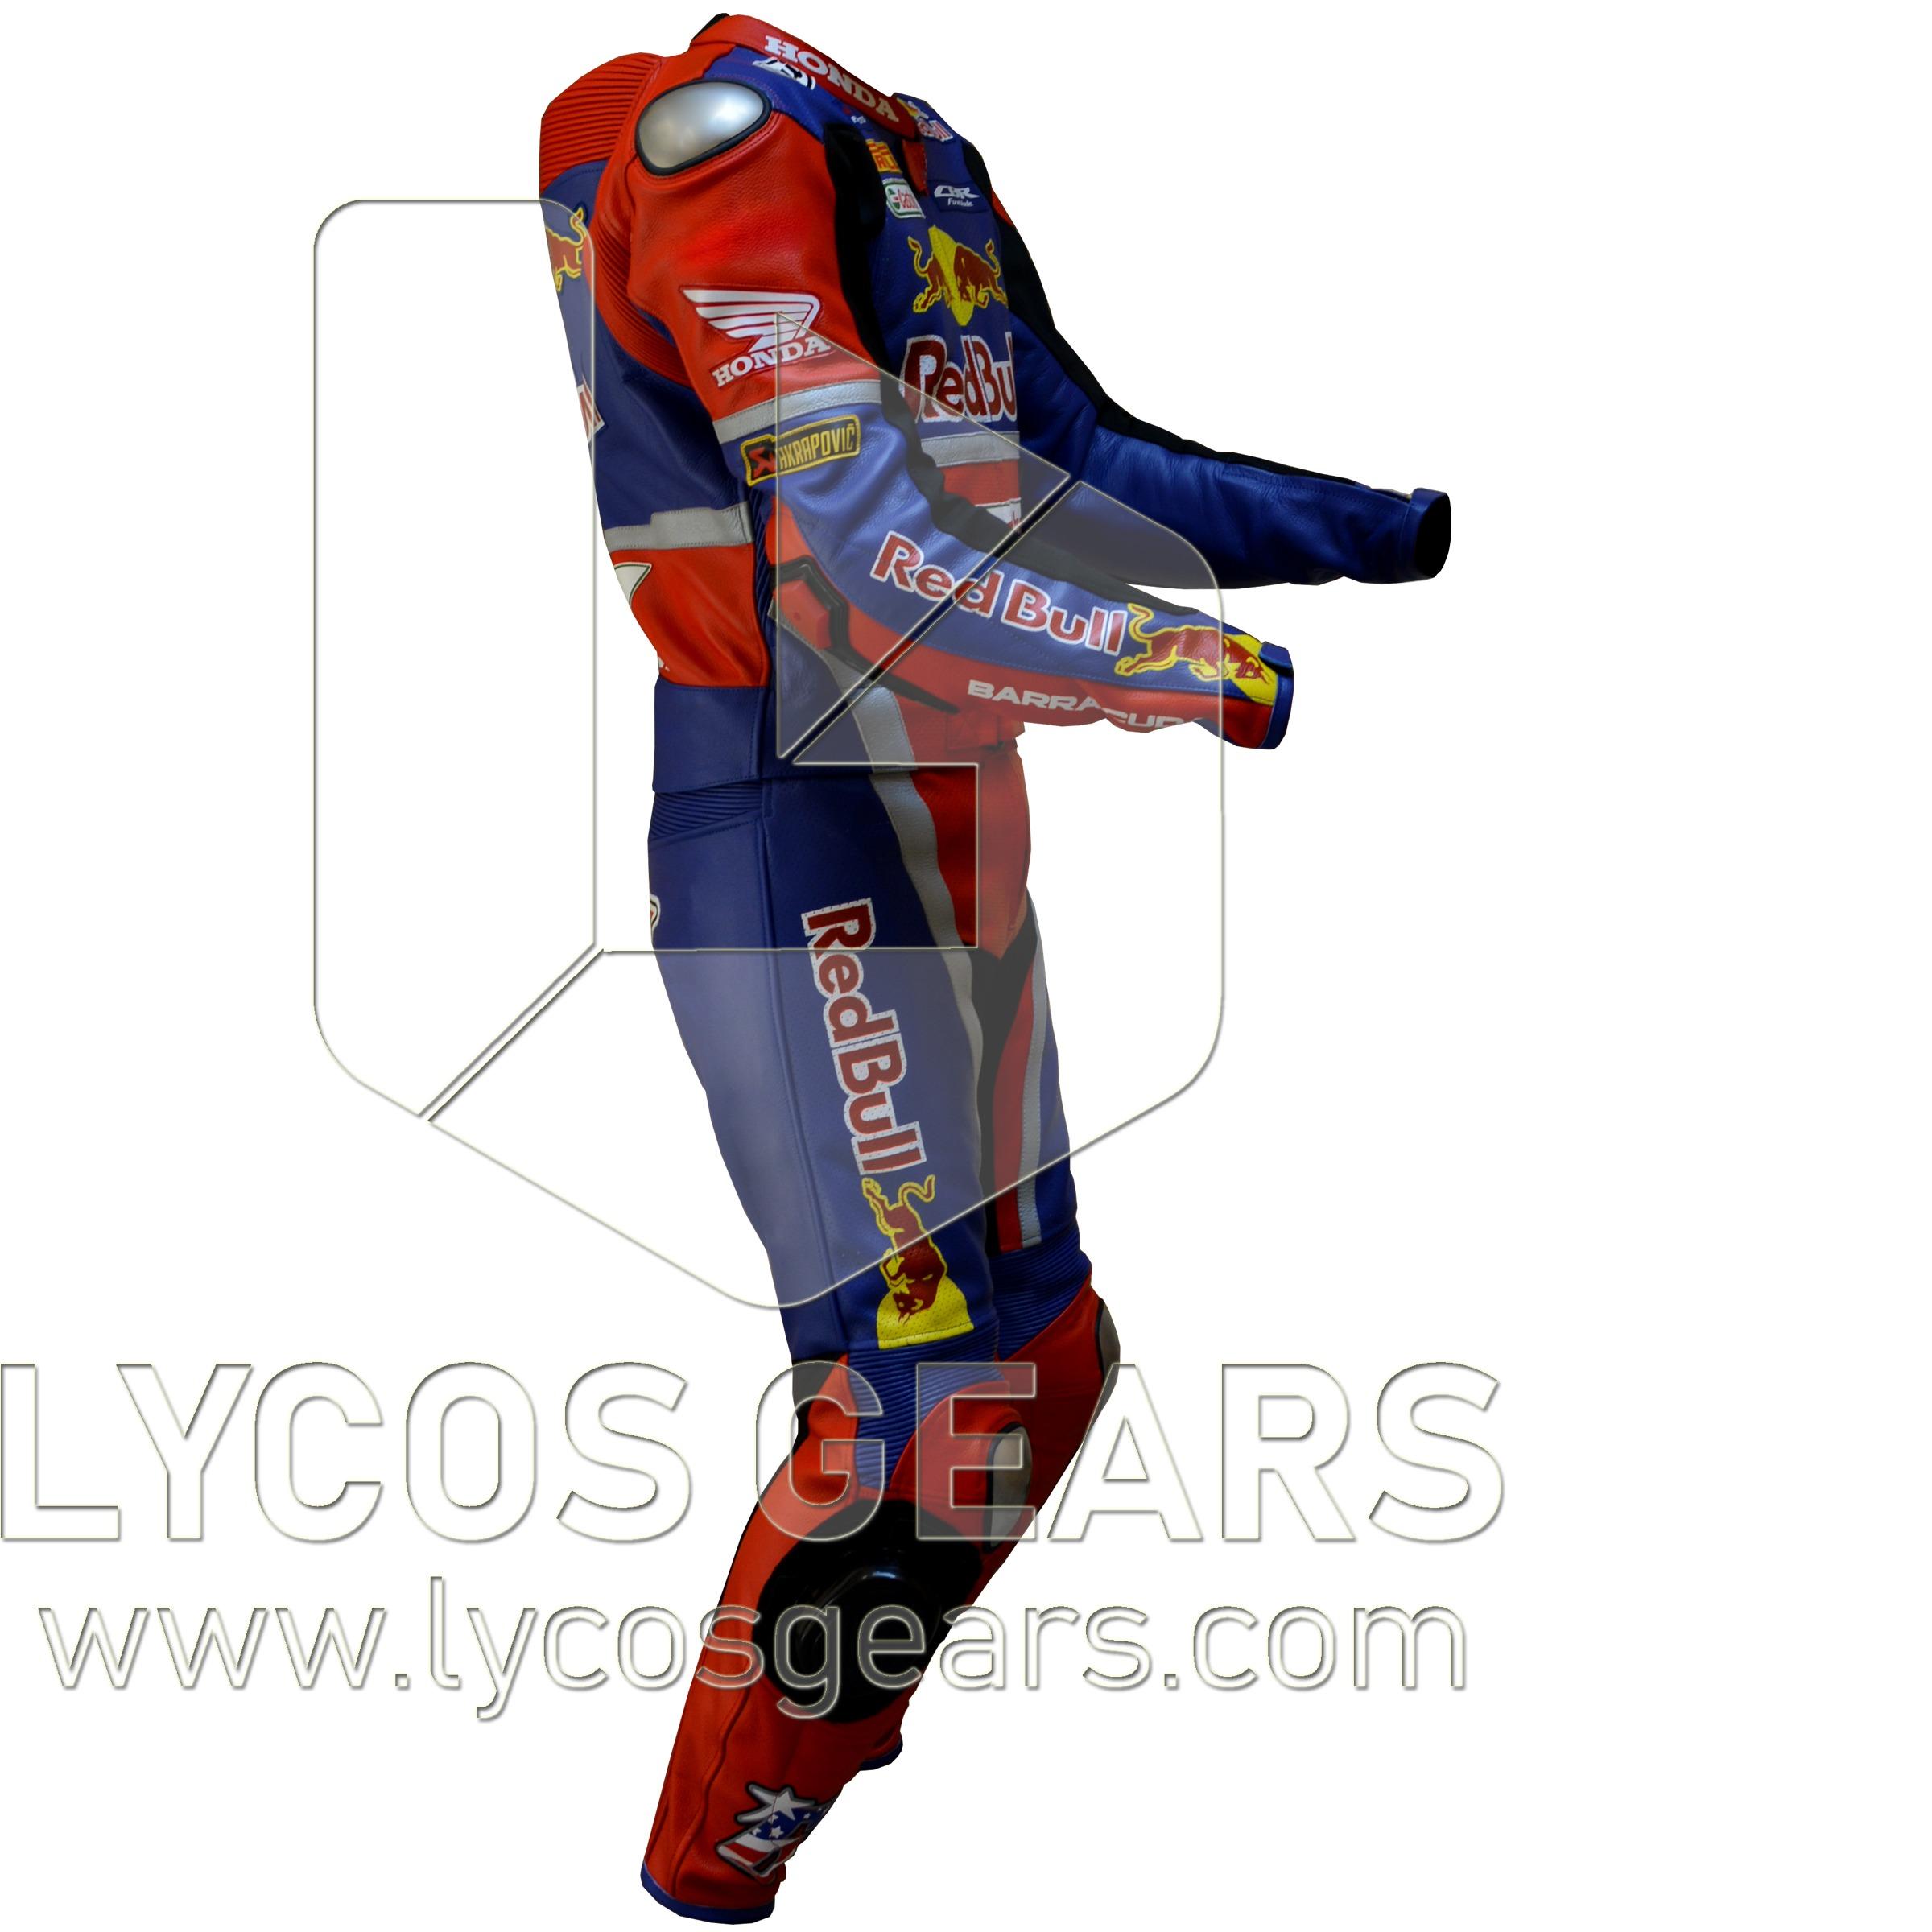 Nicky Hayden Motorbike Racing Leather Suit motorbike leather suit motorbike leathers motorbike leather suit motorbike suits motorbike leather suits motorbike shop motorbike jacket black motorbike jacket motorbike suit motorbike pant motorbike helmets leath